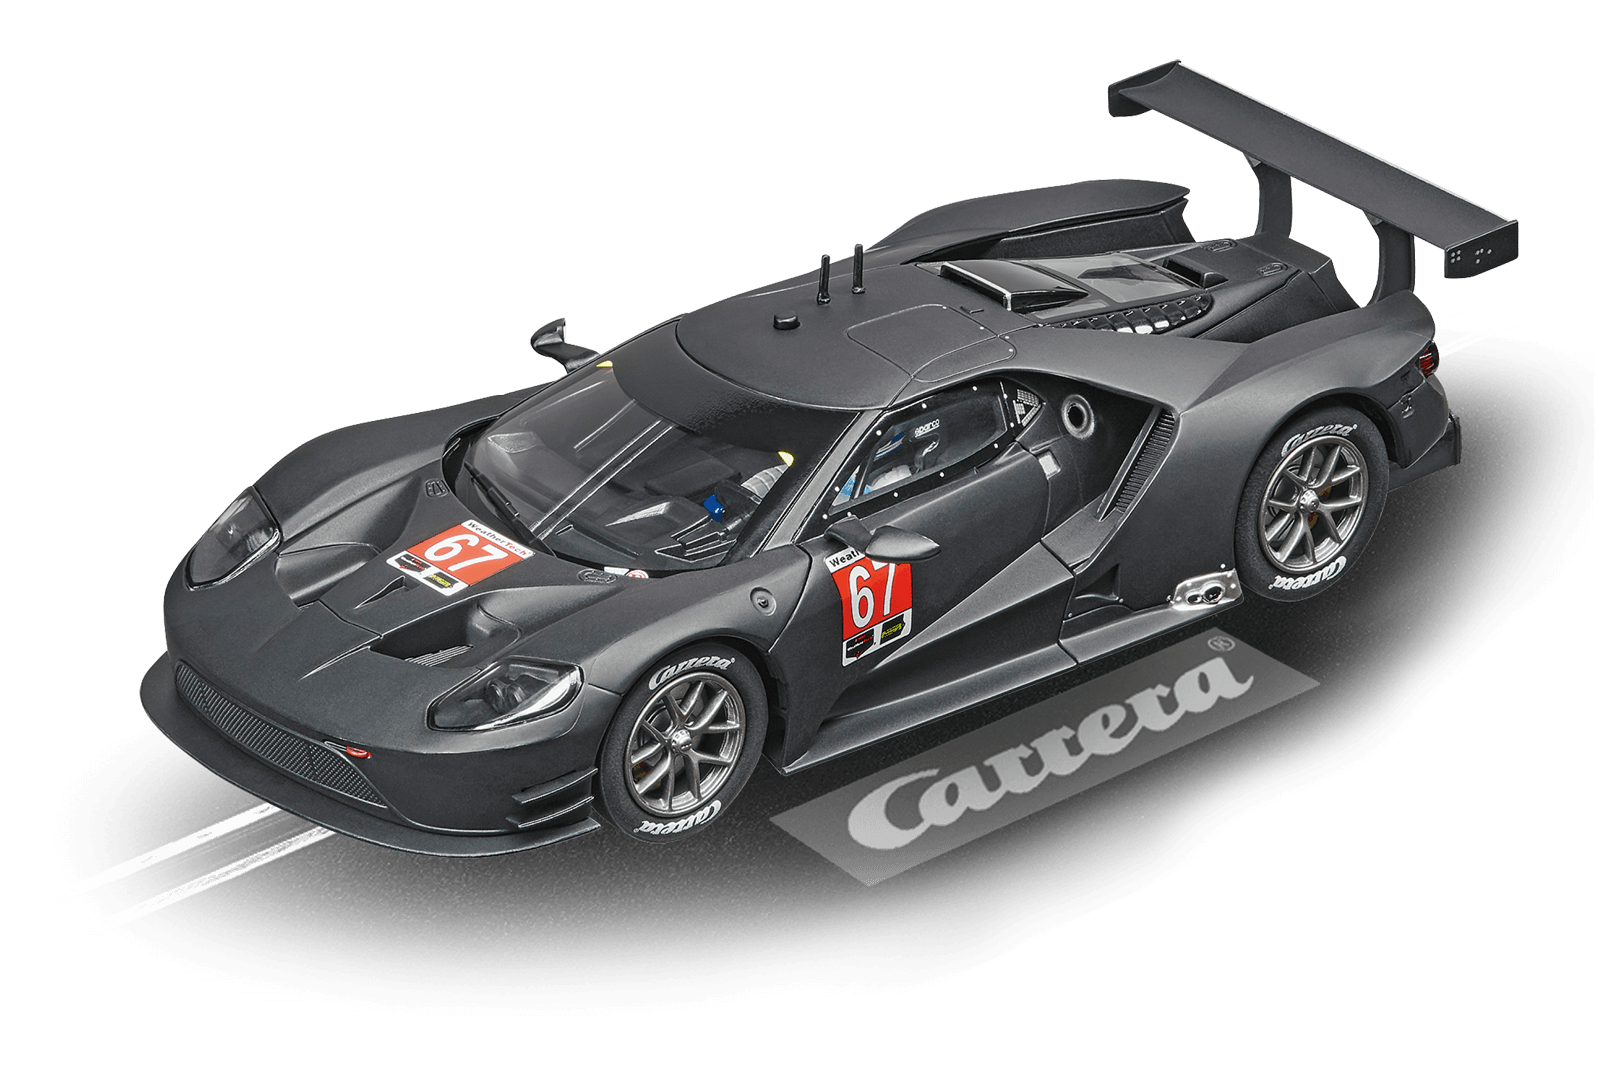 Top Tuning Carrera Digital 132 - Ford Gt Race Car